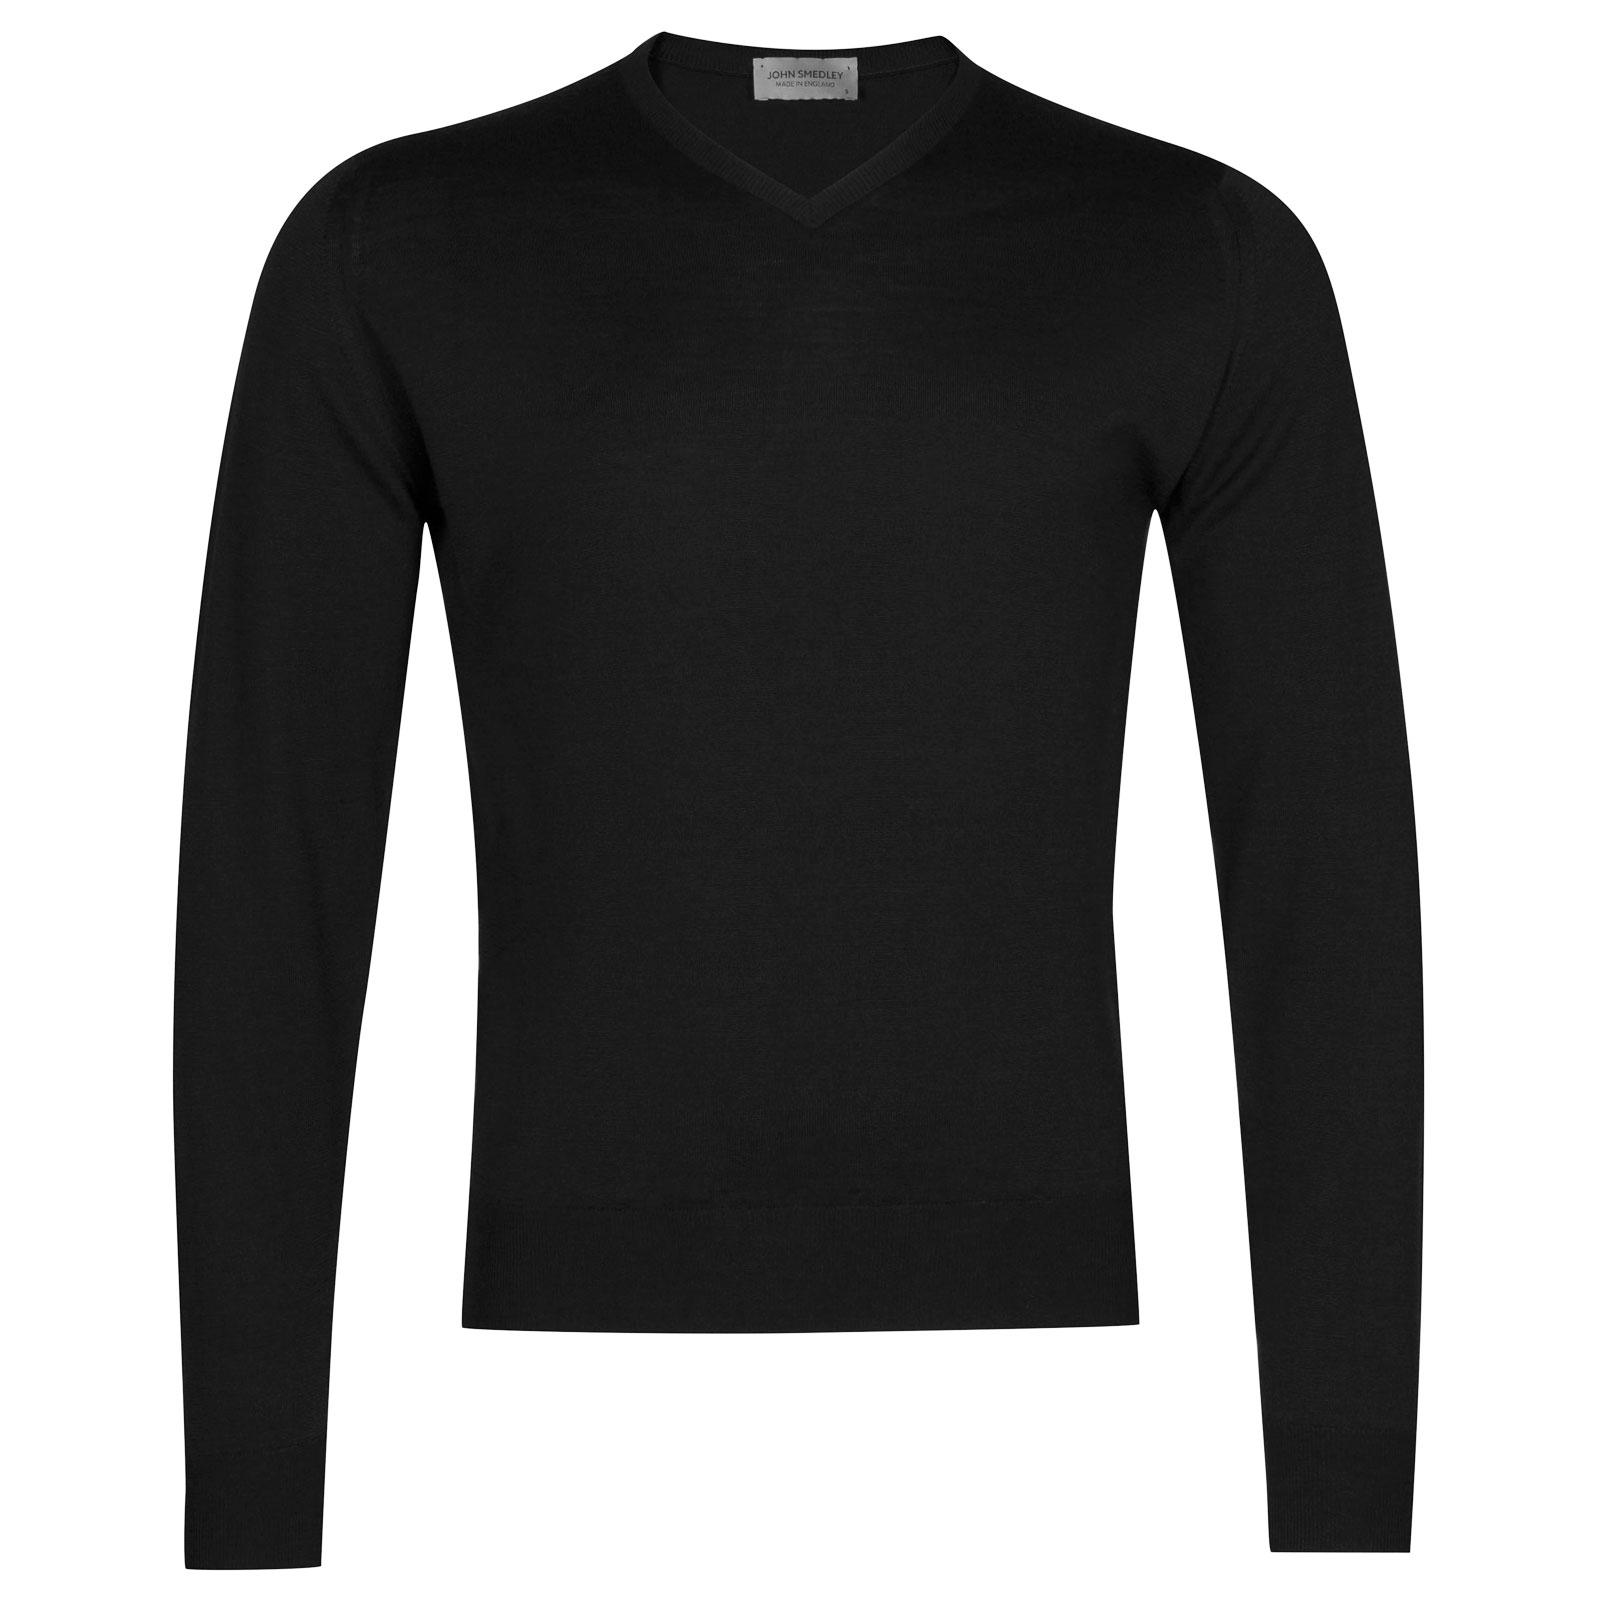 John Smedley Genoa Merino Wool Pullover in Black-L